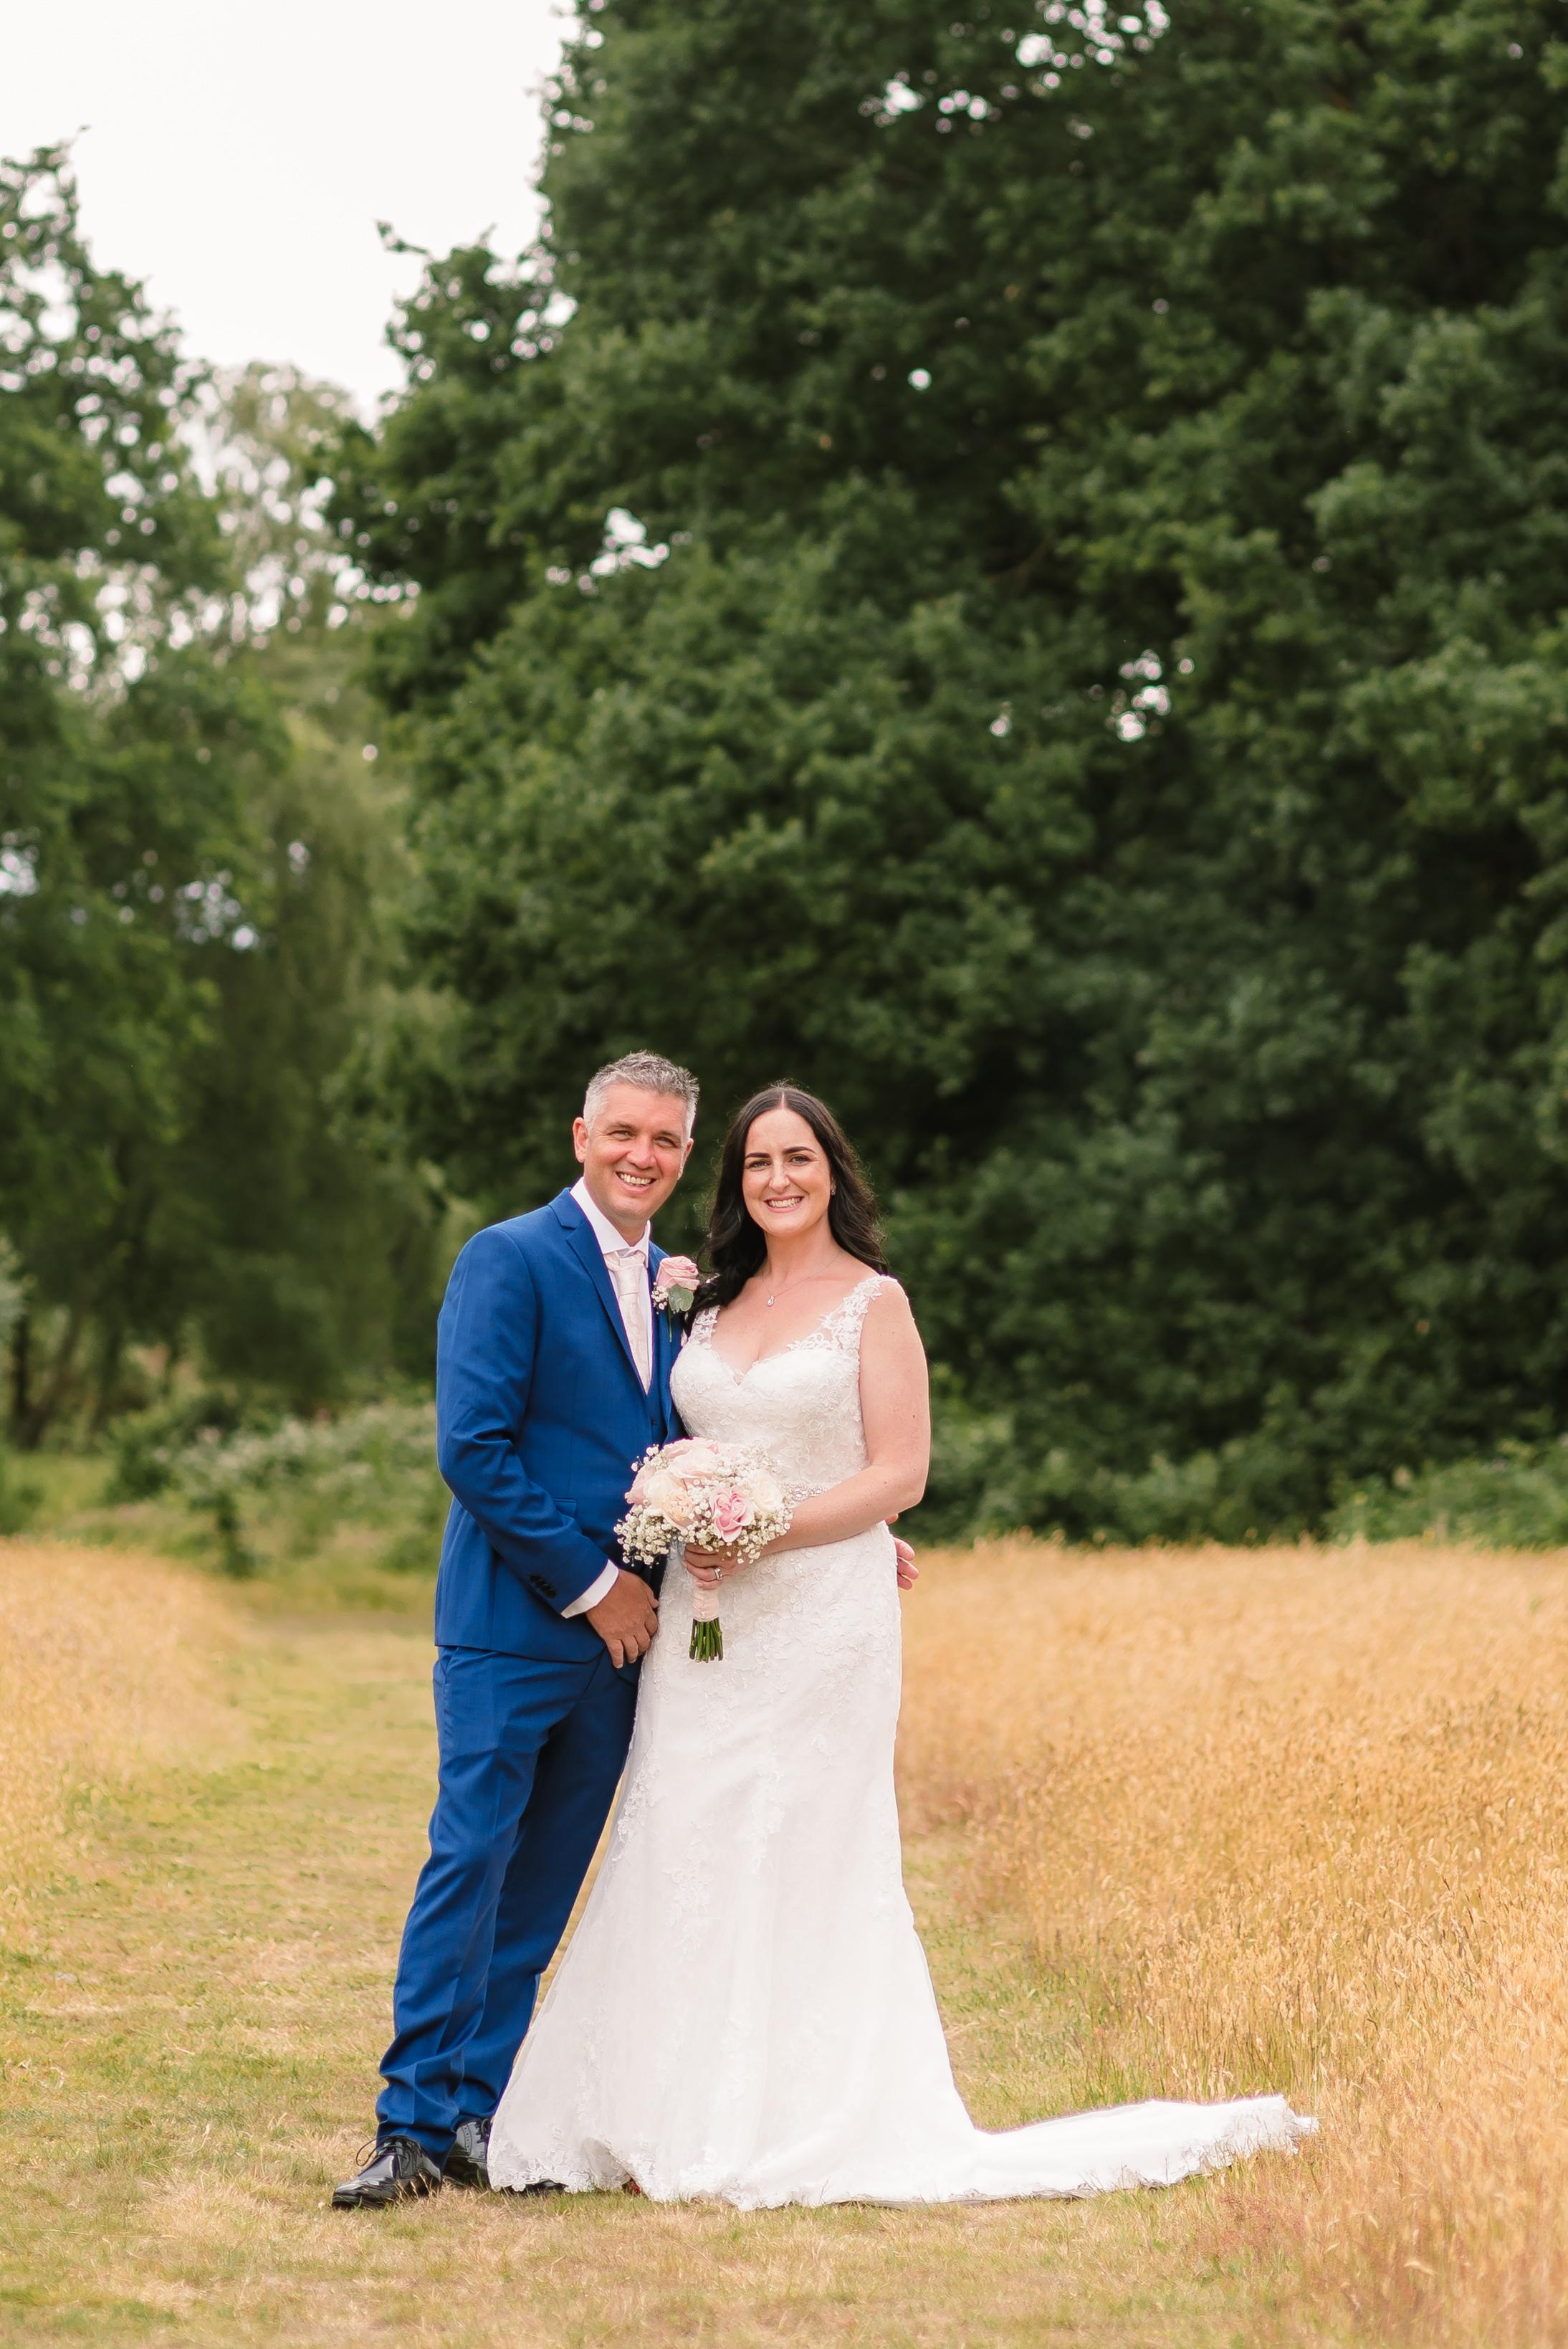 Sarah-Fishlock-Photography : Hampshire-wedding-photographer-hampshire : fleet-wedding-photographer-fleet : Meade-Hall-Wedding-Photographer : Meade-Hall-Wedding-Photos-754.jpg